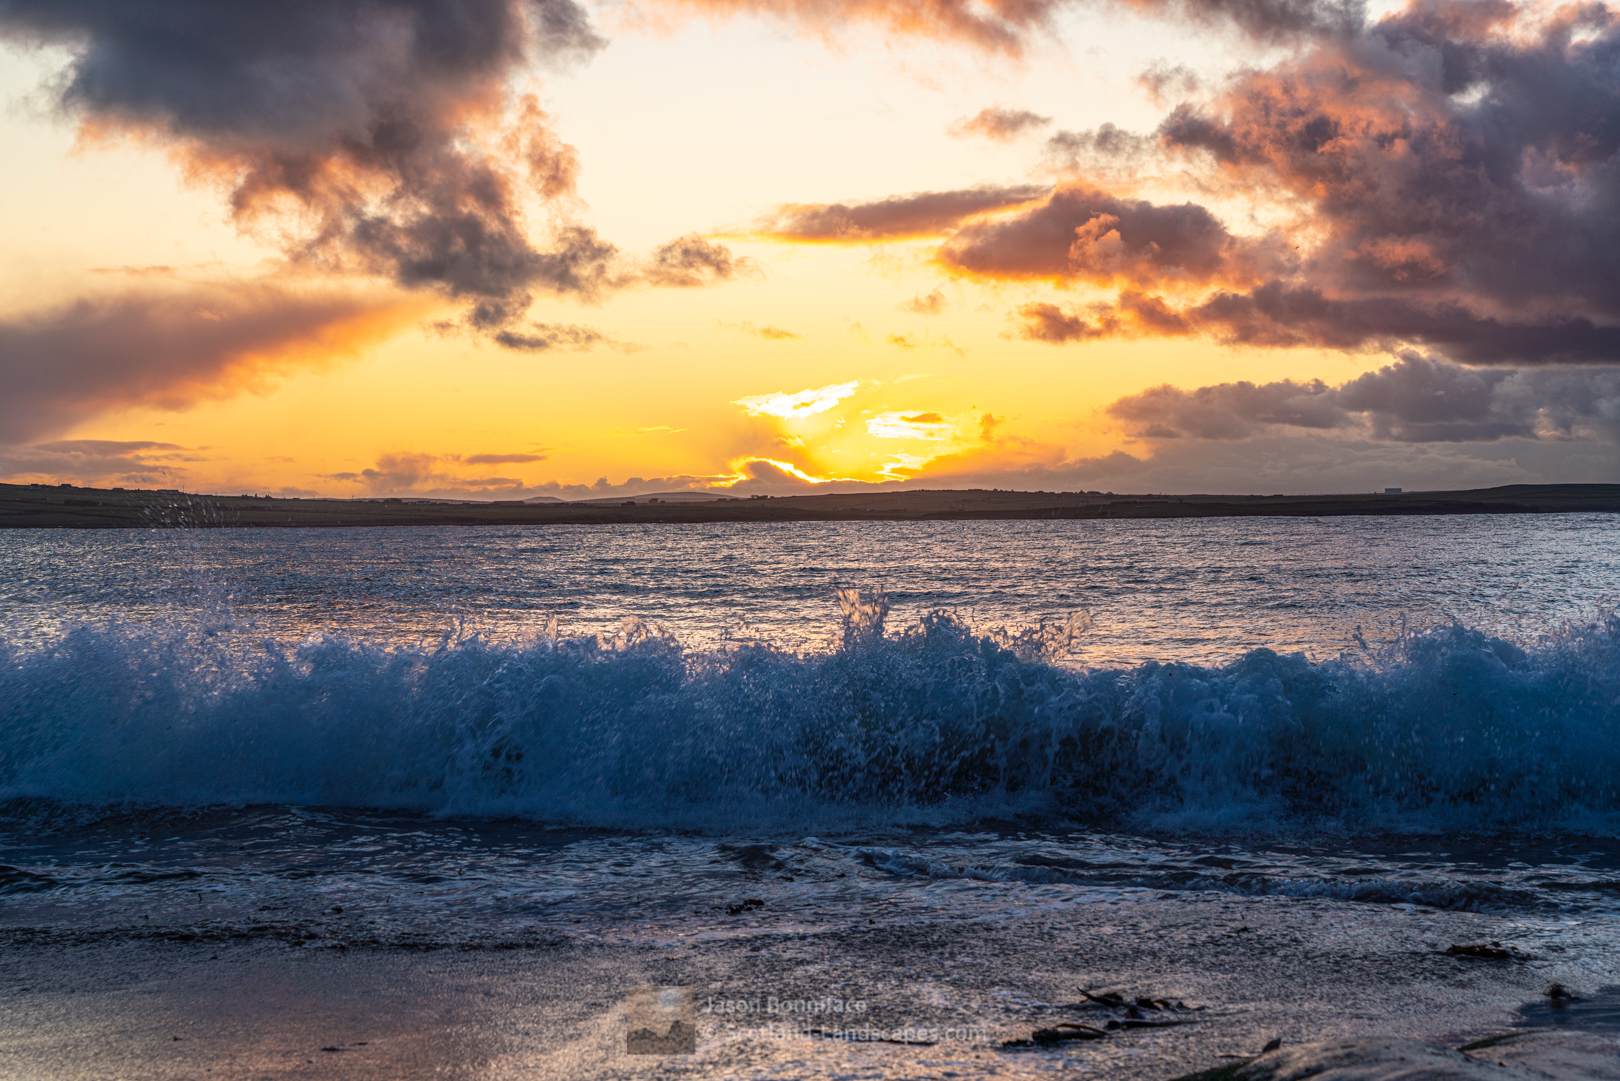 Sunset and surf at Peedie Beach